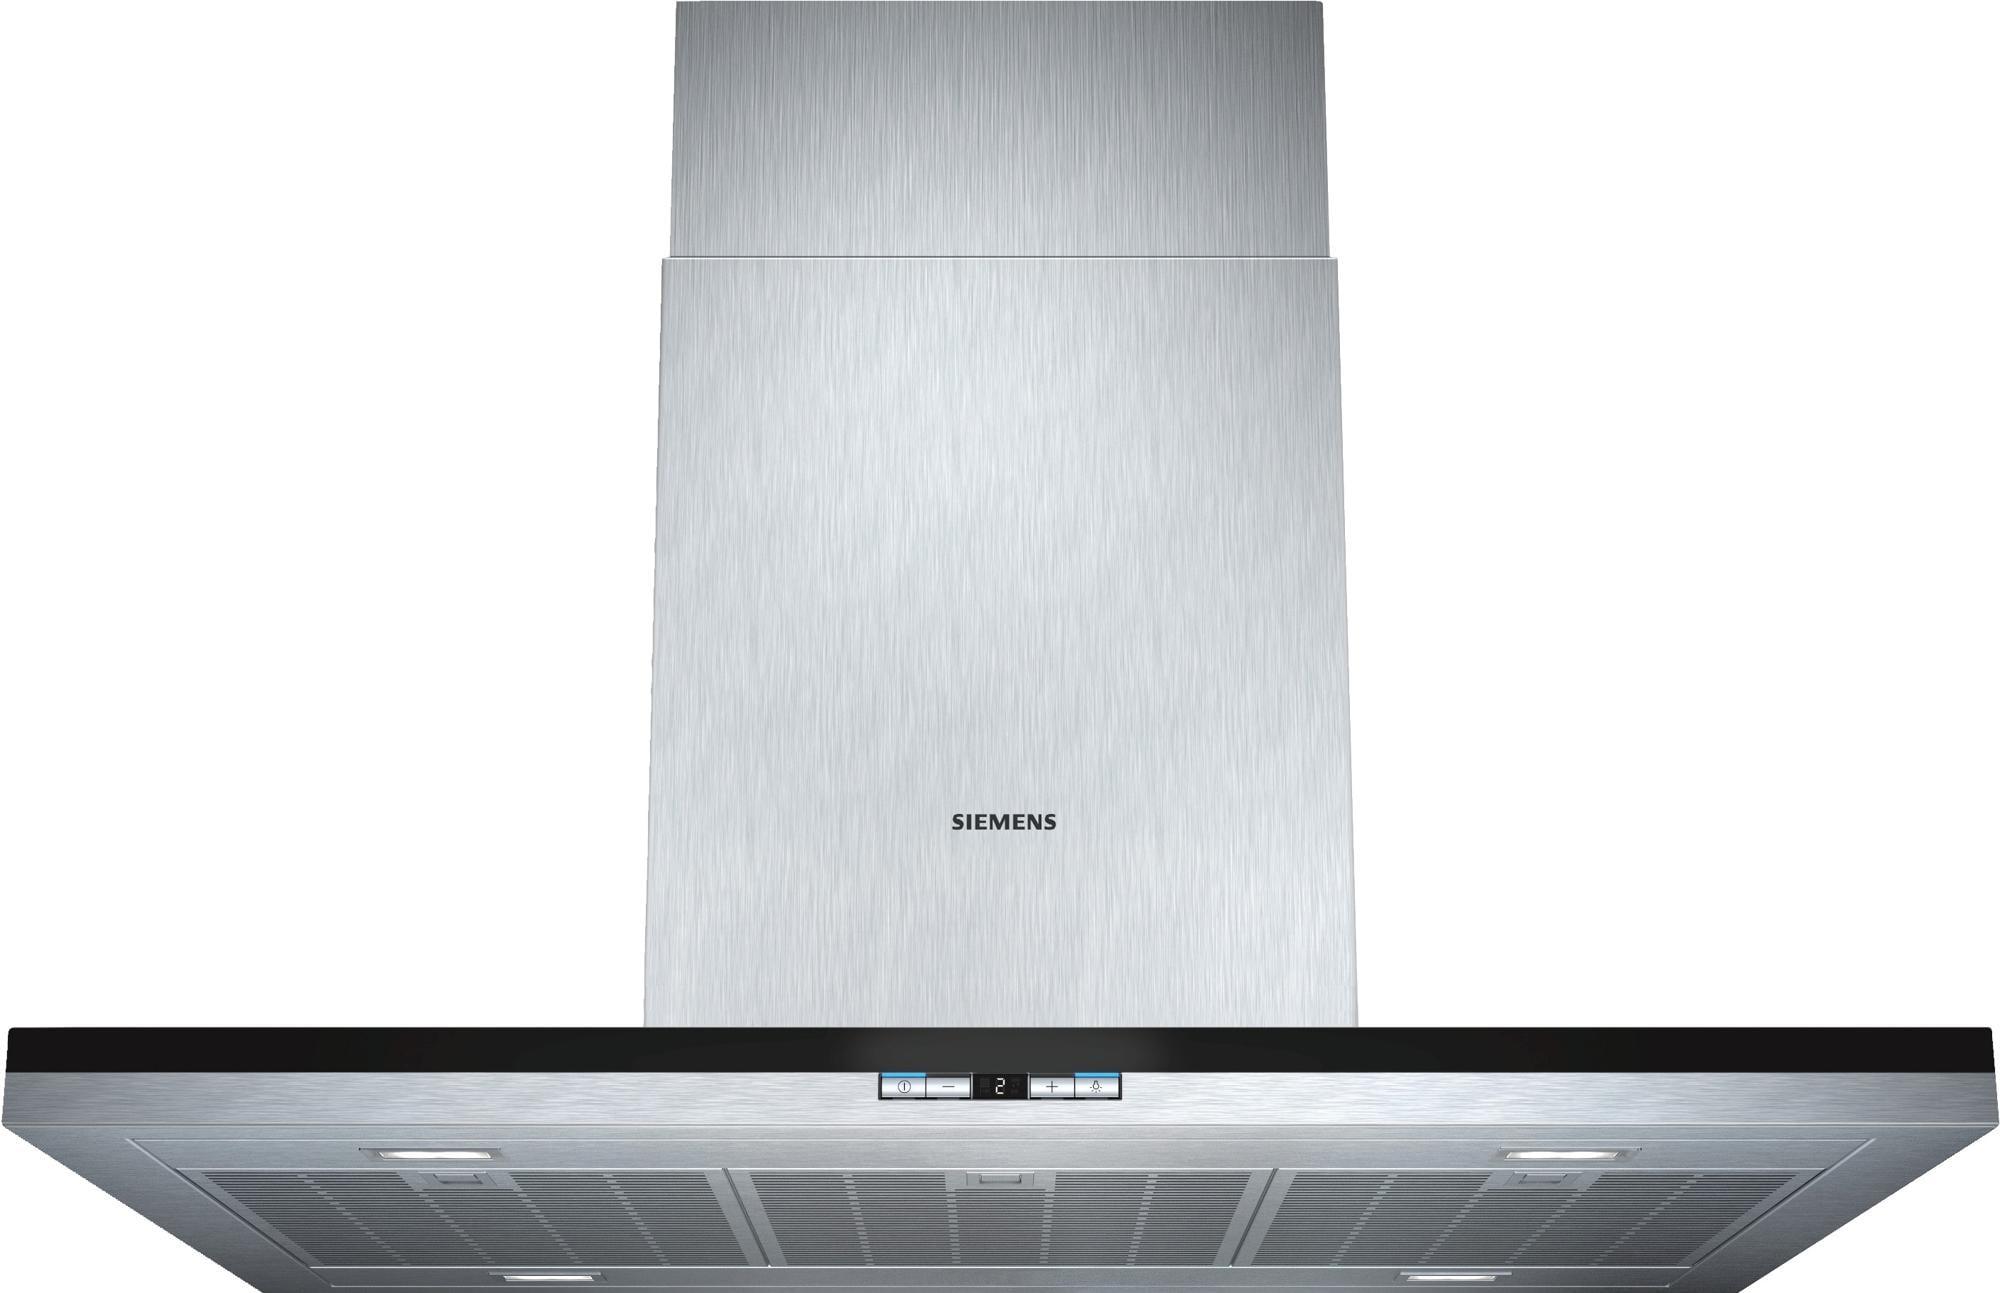 Siemens LF98BC542 A+ Inselhaube, 90 Cm Breit, Ab  U0026 Umluft, Edelstahl